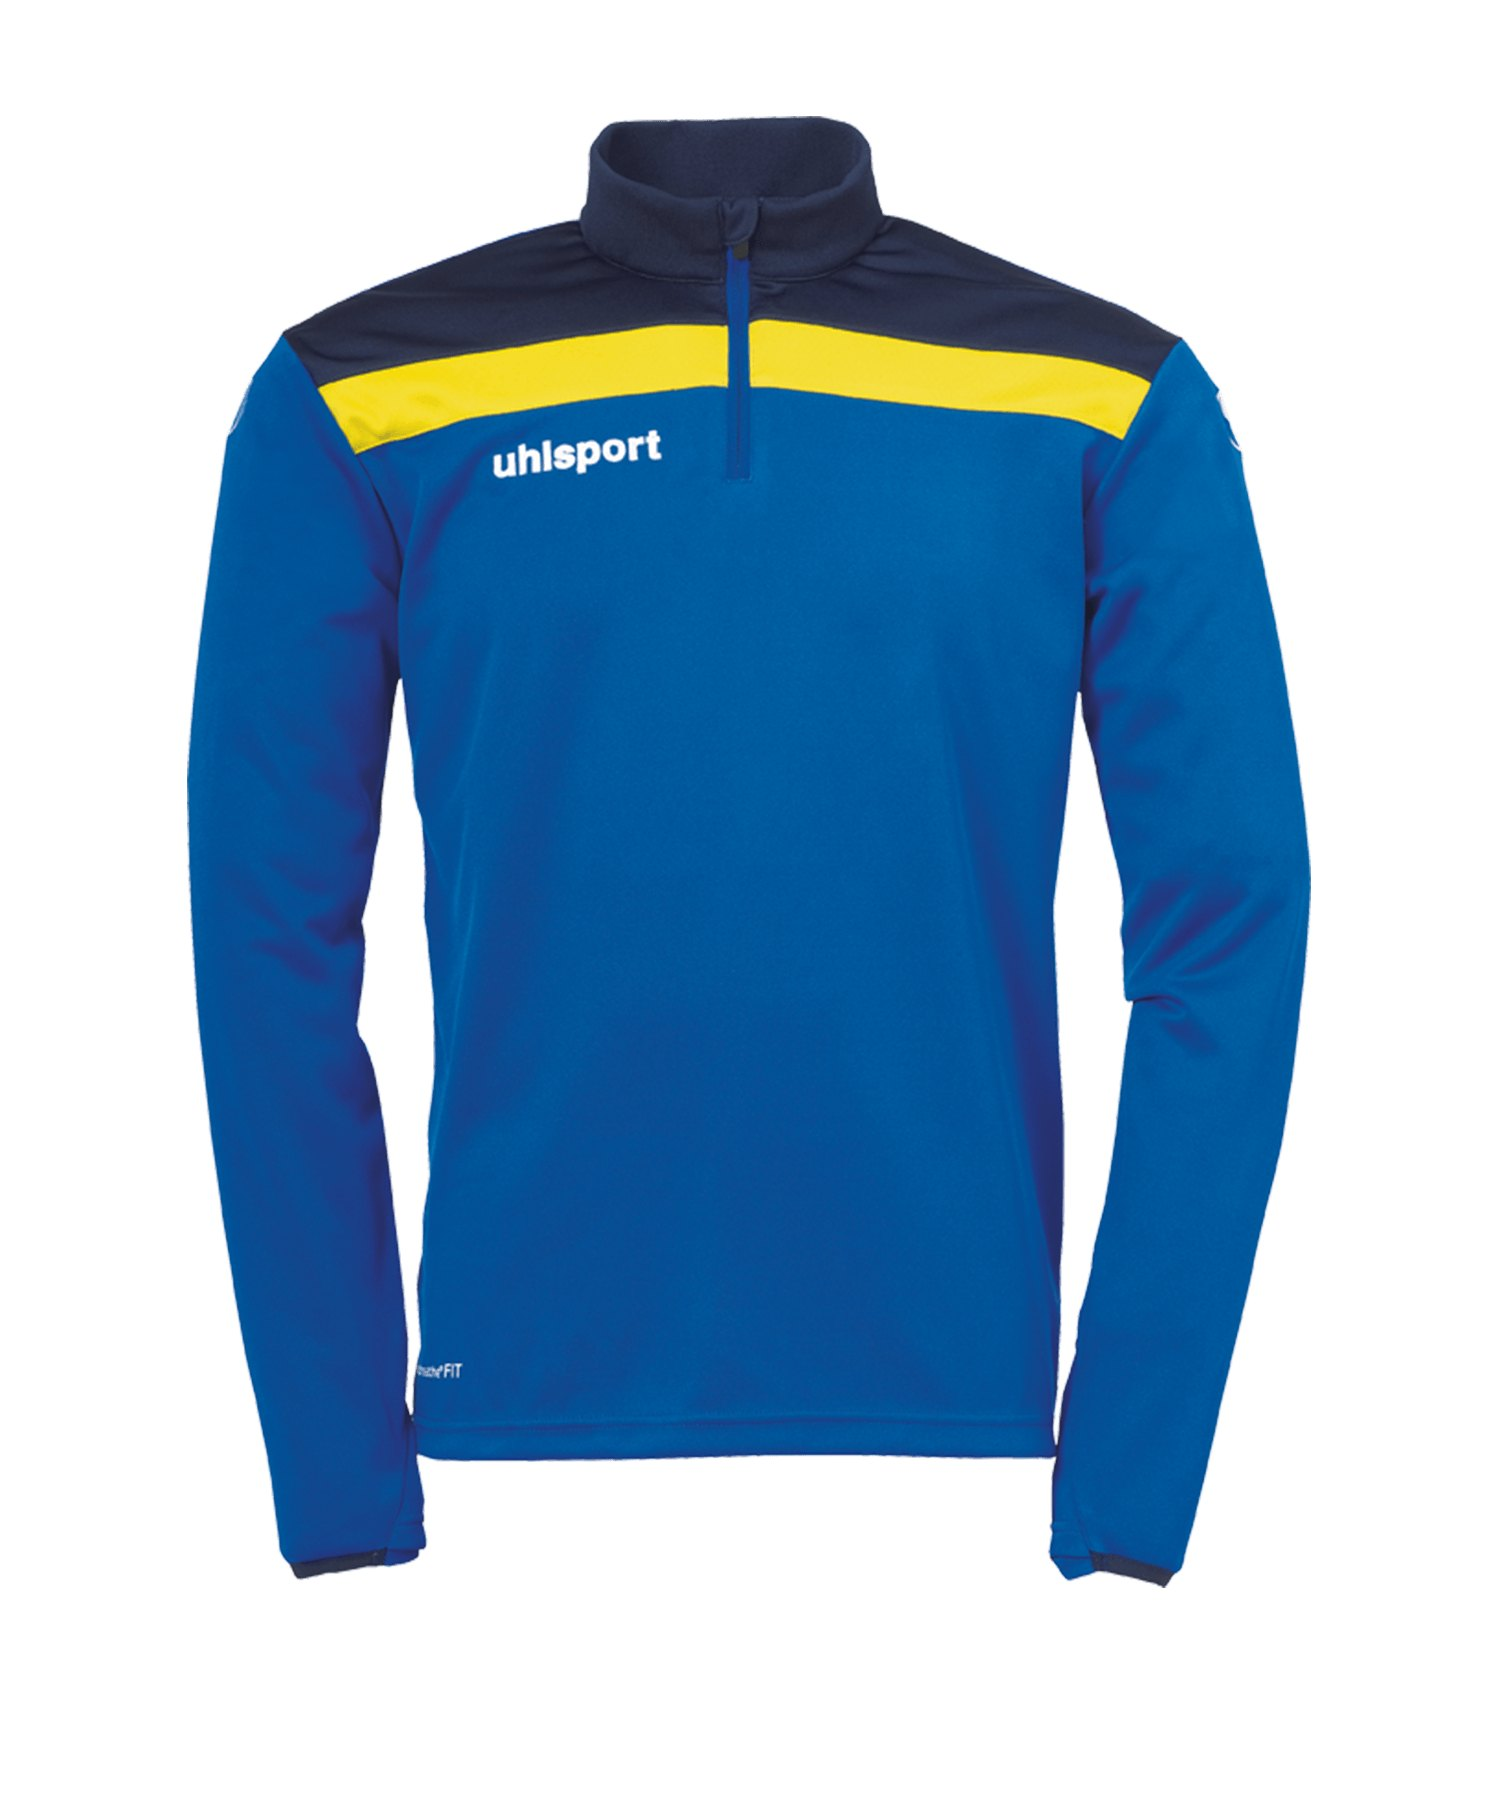 Uhlsport Offense 23 Ziptop Kids Blau F11 - blau